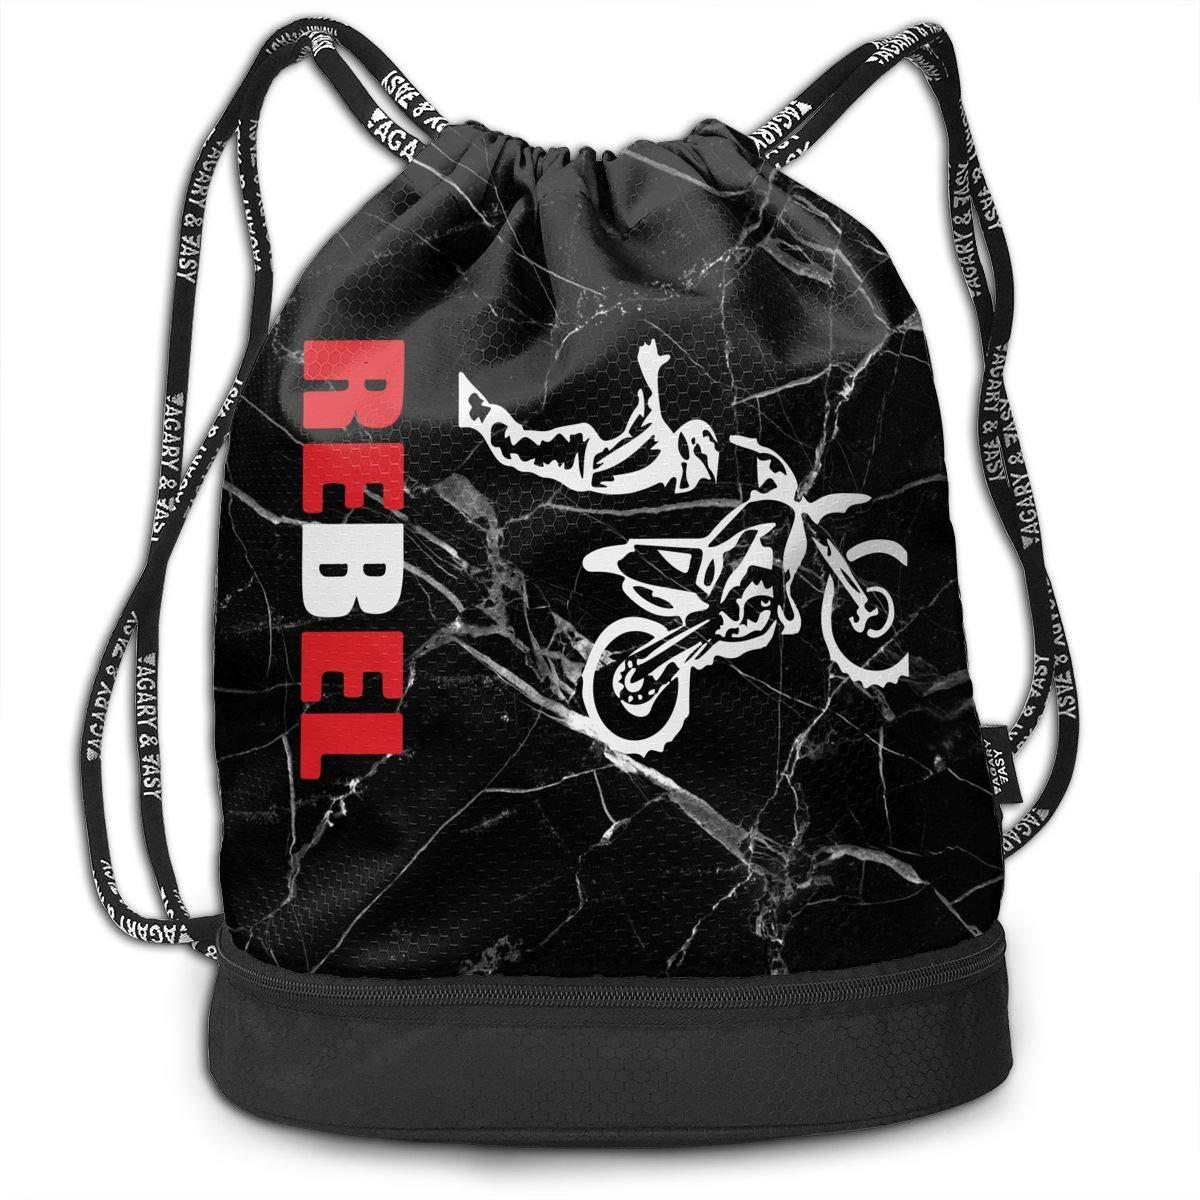 Drawstring Bag High Flying Rebel Motocross Men And Women Yoga Dance Travel Shoulder Bags